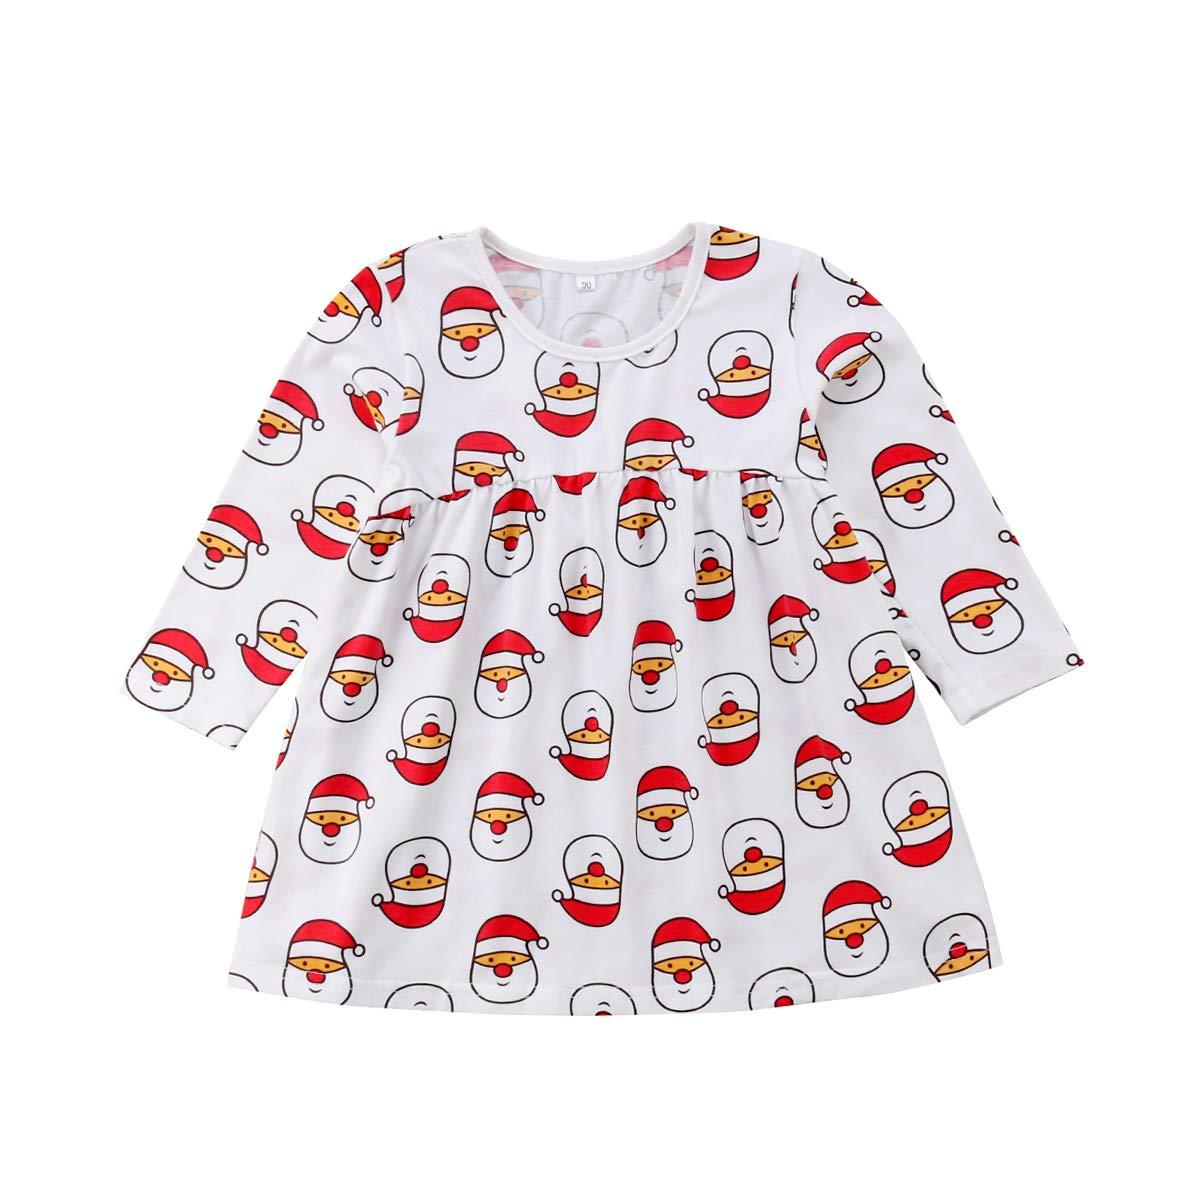 8972c5f823998 Amazon.com: ZWINZ Baby Little Girls Christmas Dress Long Sleeve Santa Claus  Print Tutu Holiday Dress: Clothing